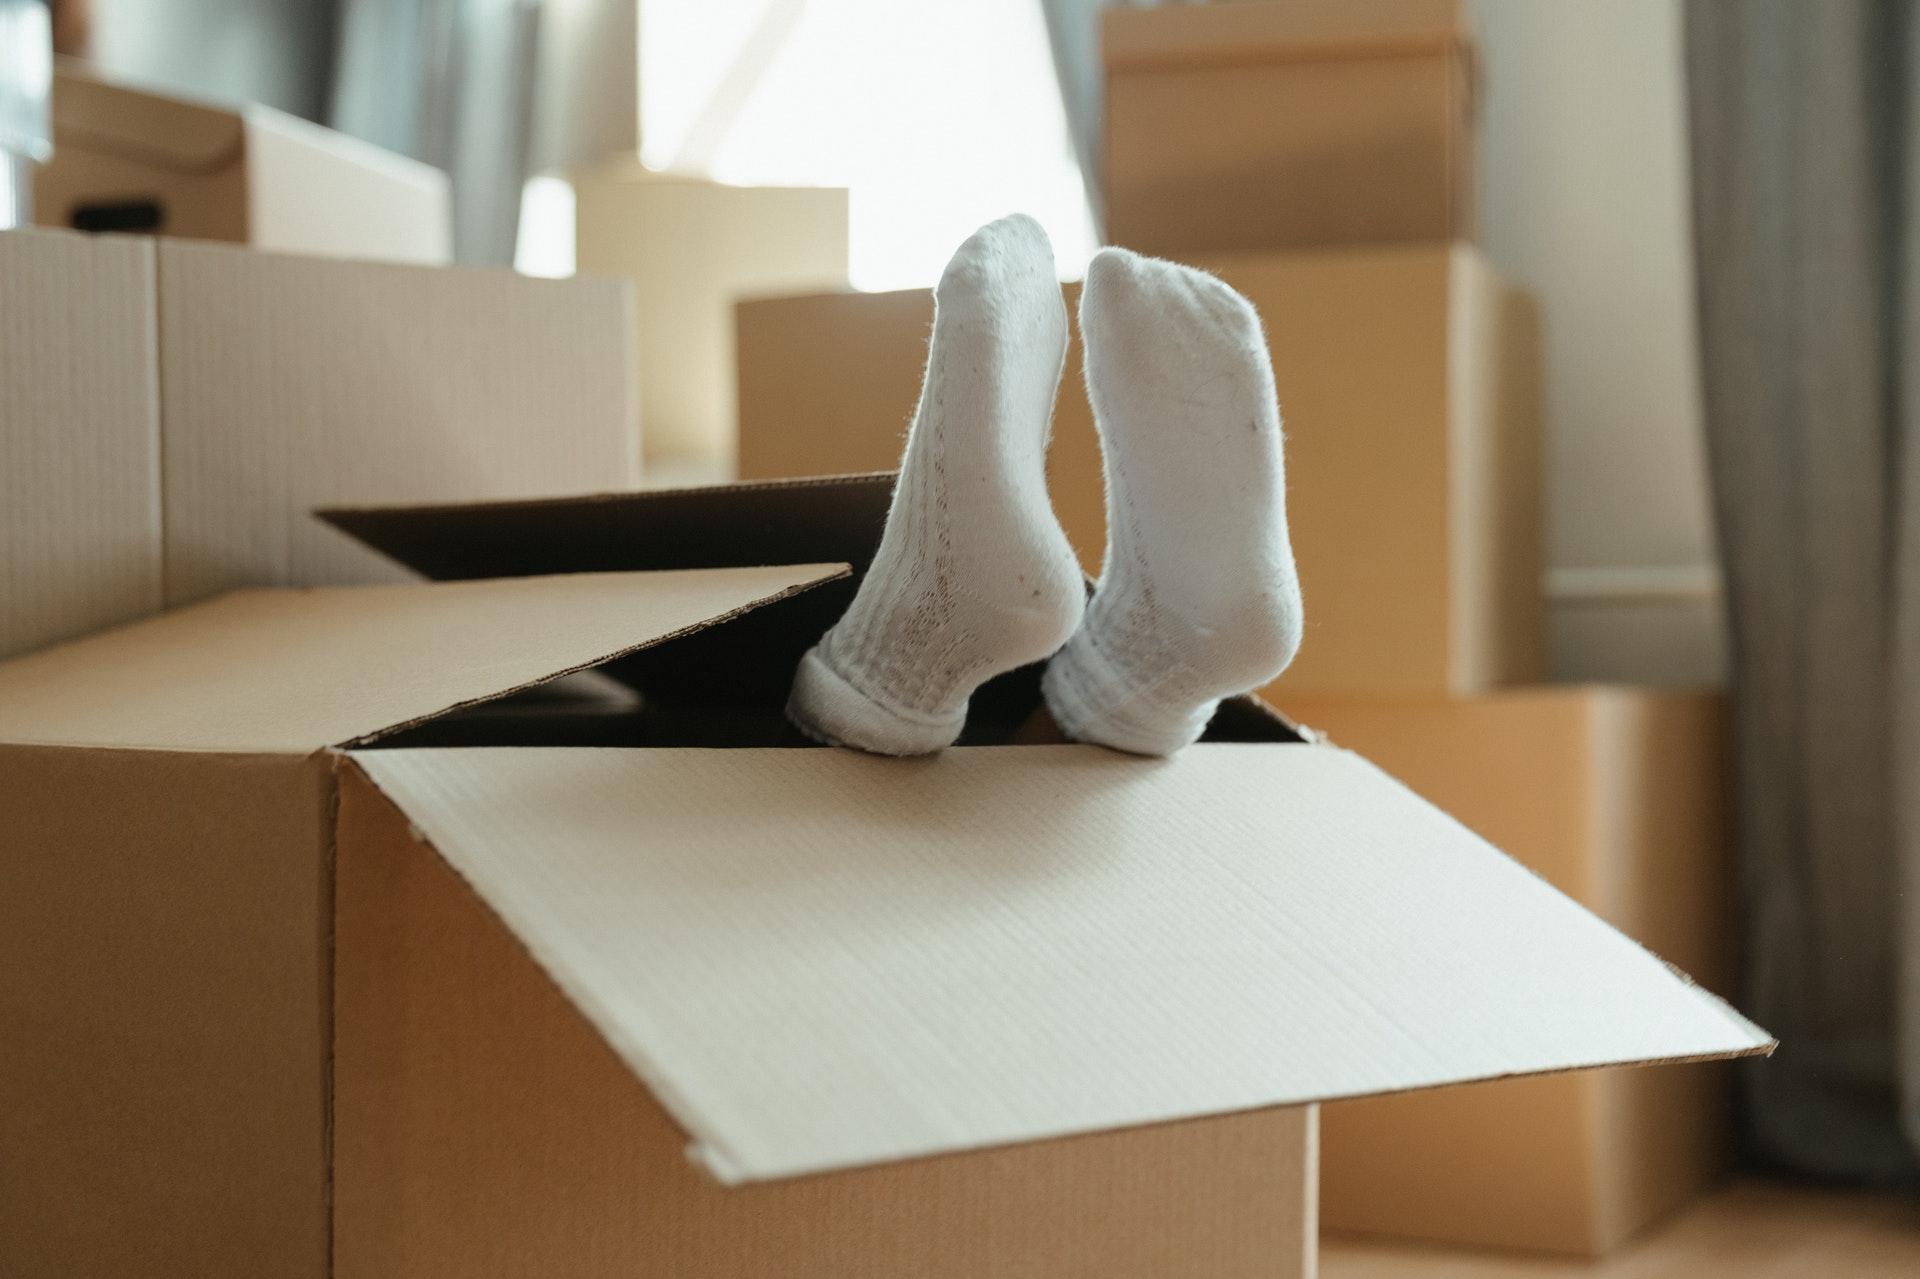 Laundry washing socks is a total headache.